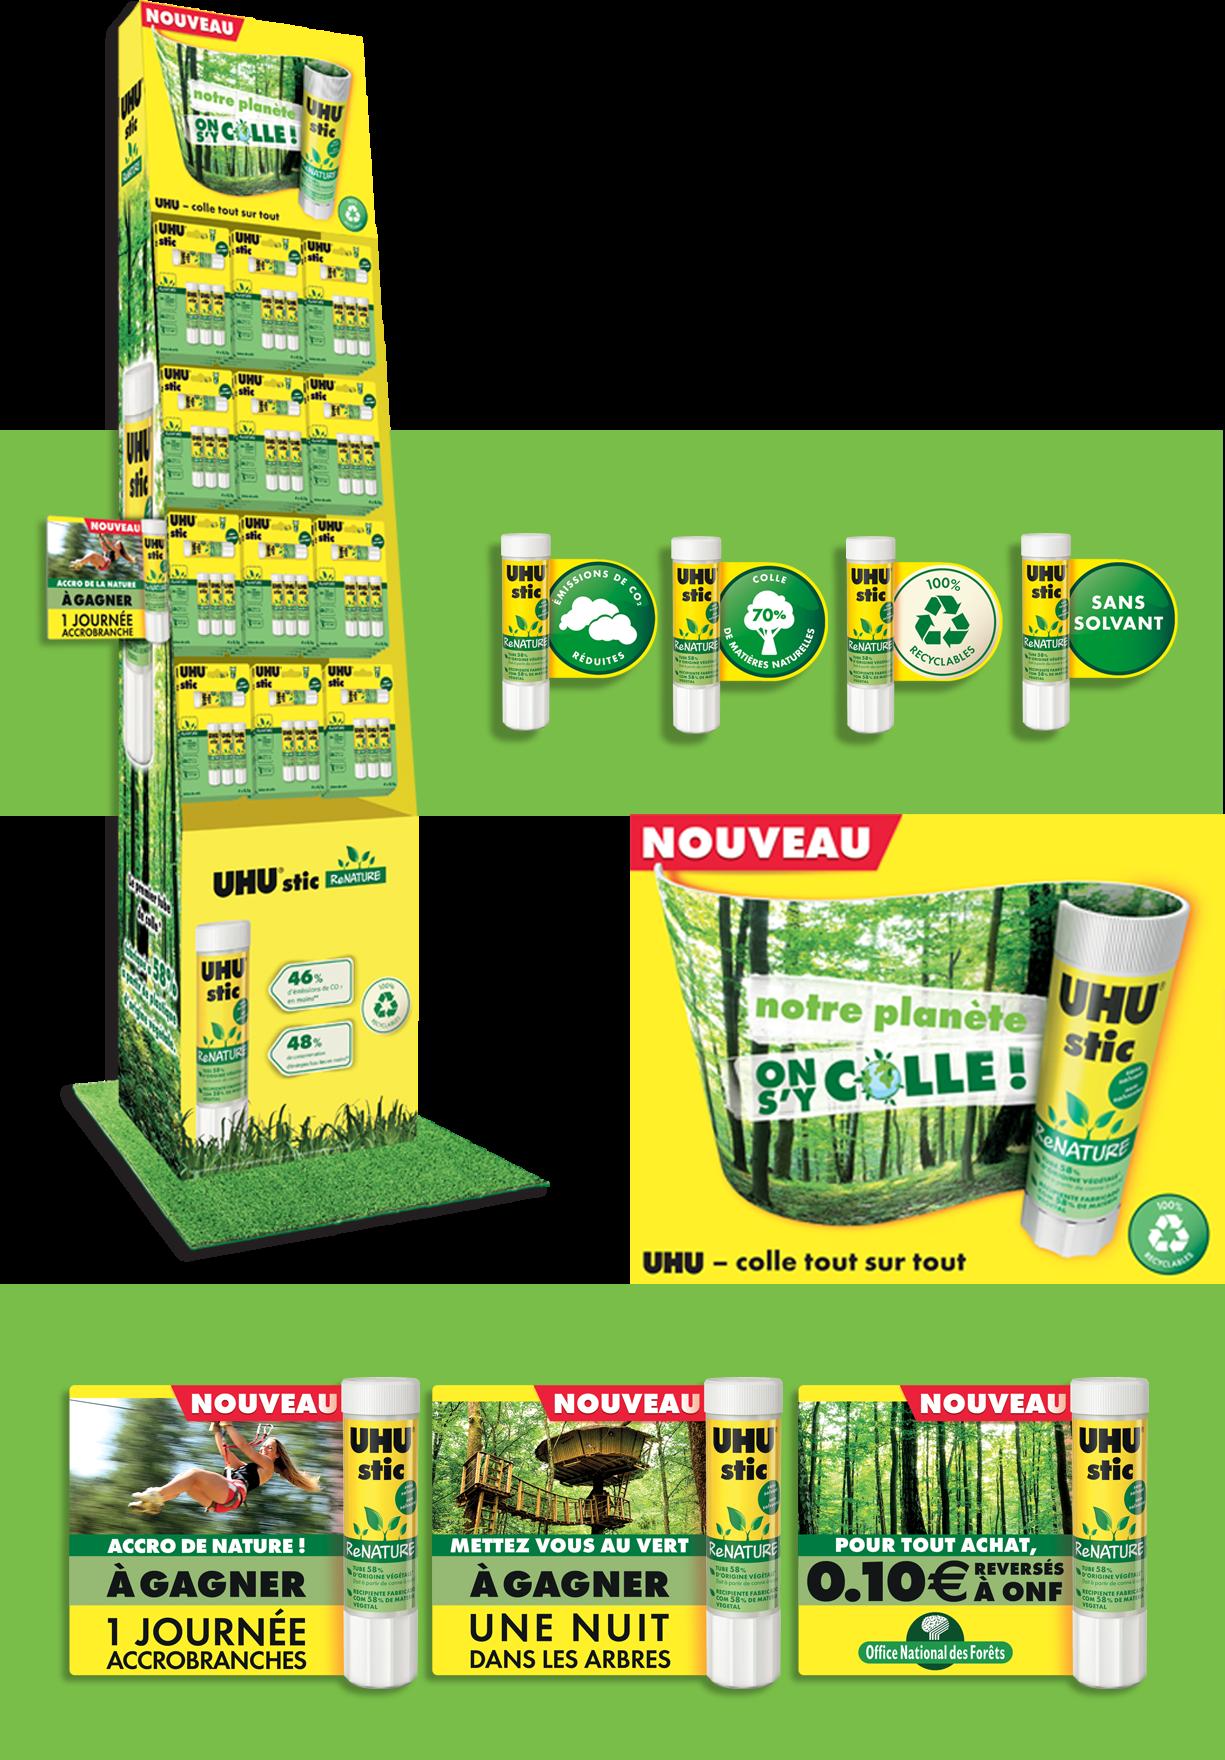 Agence communication Rangoon - shopper marketing identite visuelle colle UHU engagement eco responsable